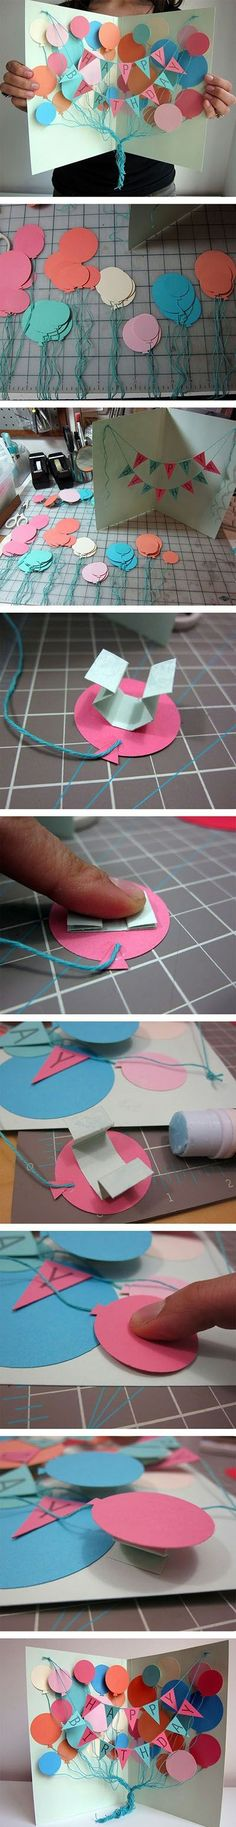 Beautiful Paper Craft | DIY & Crafts Tutorials